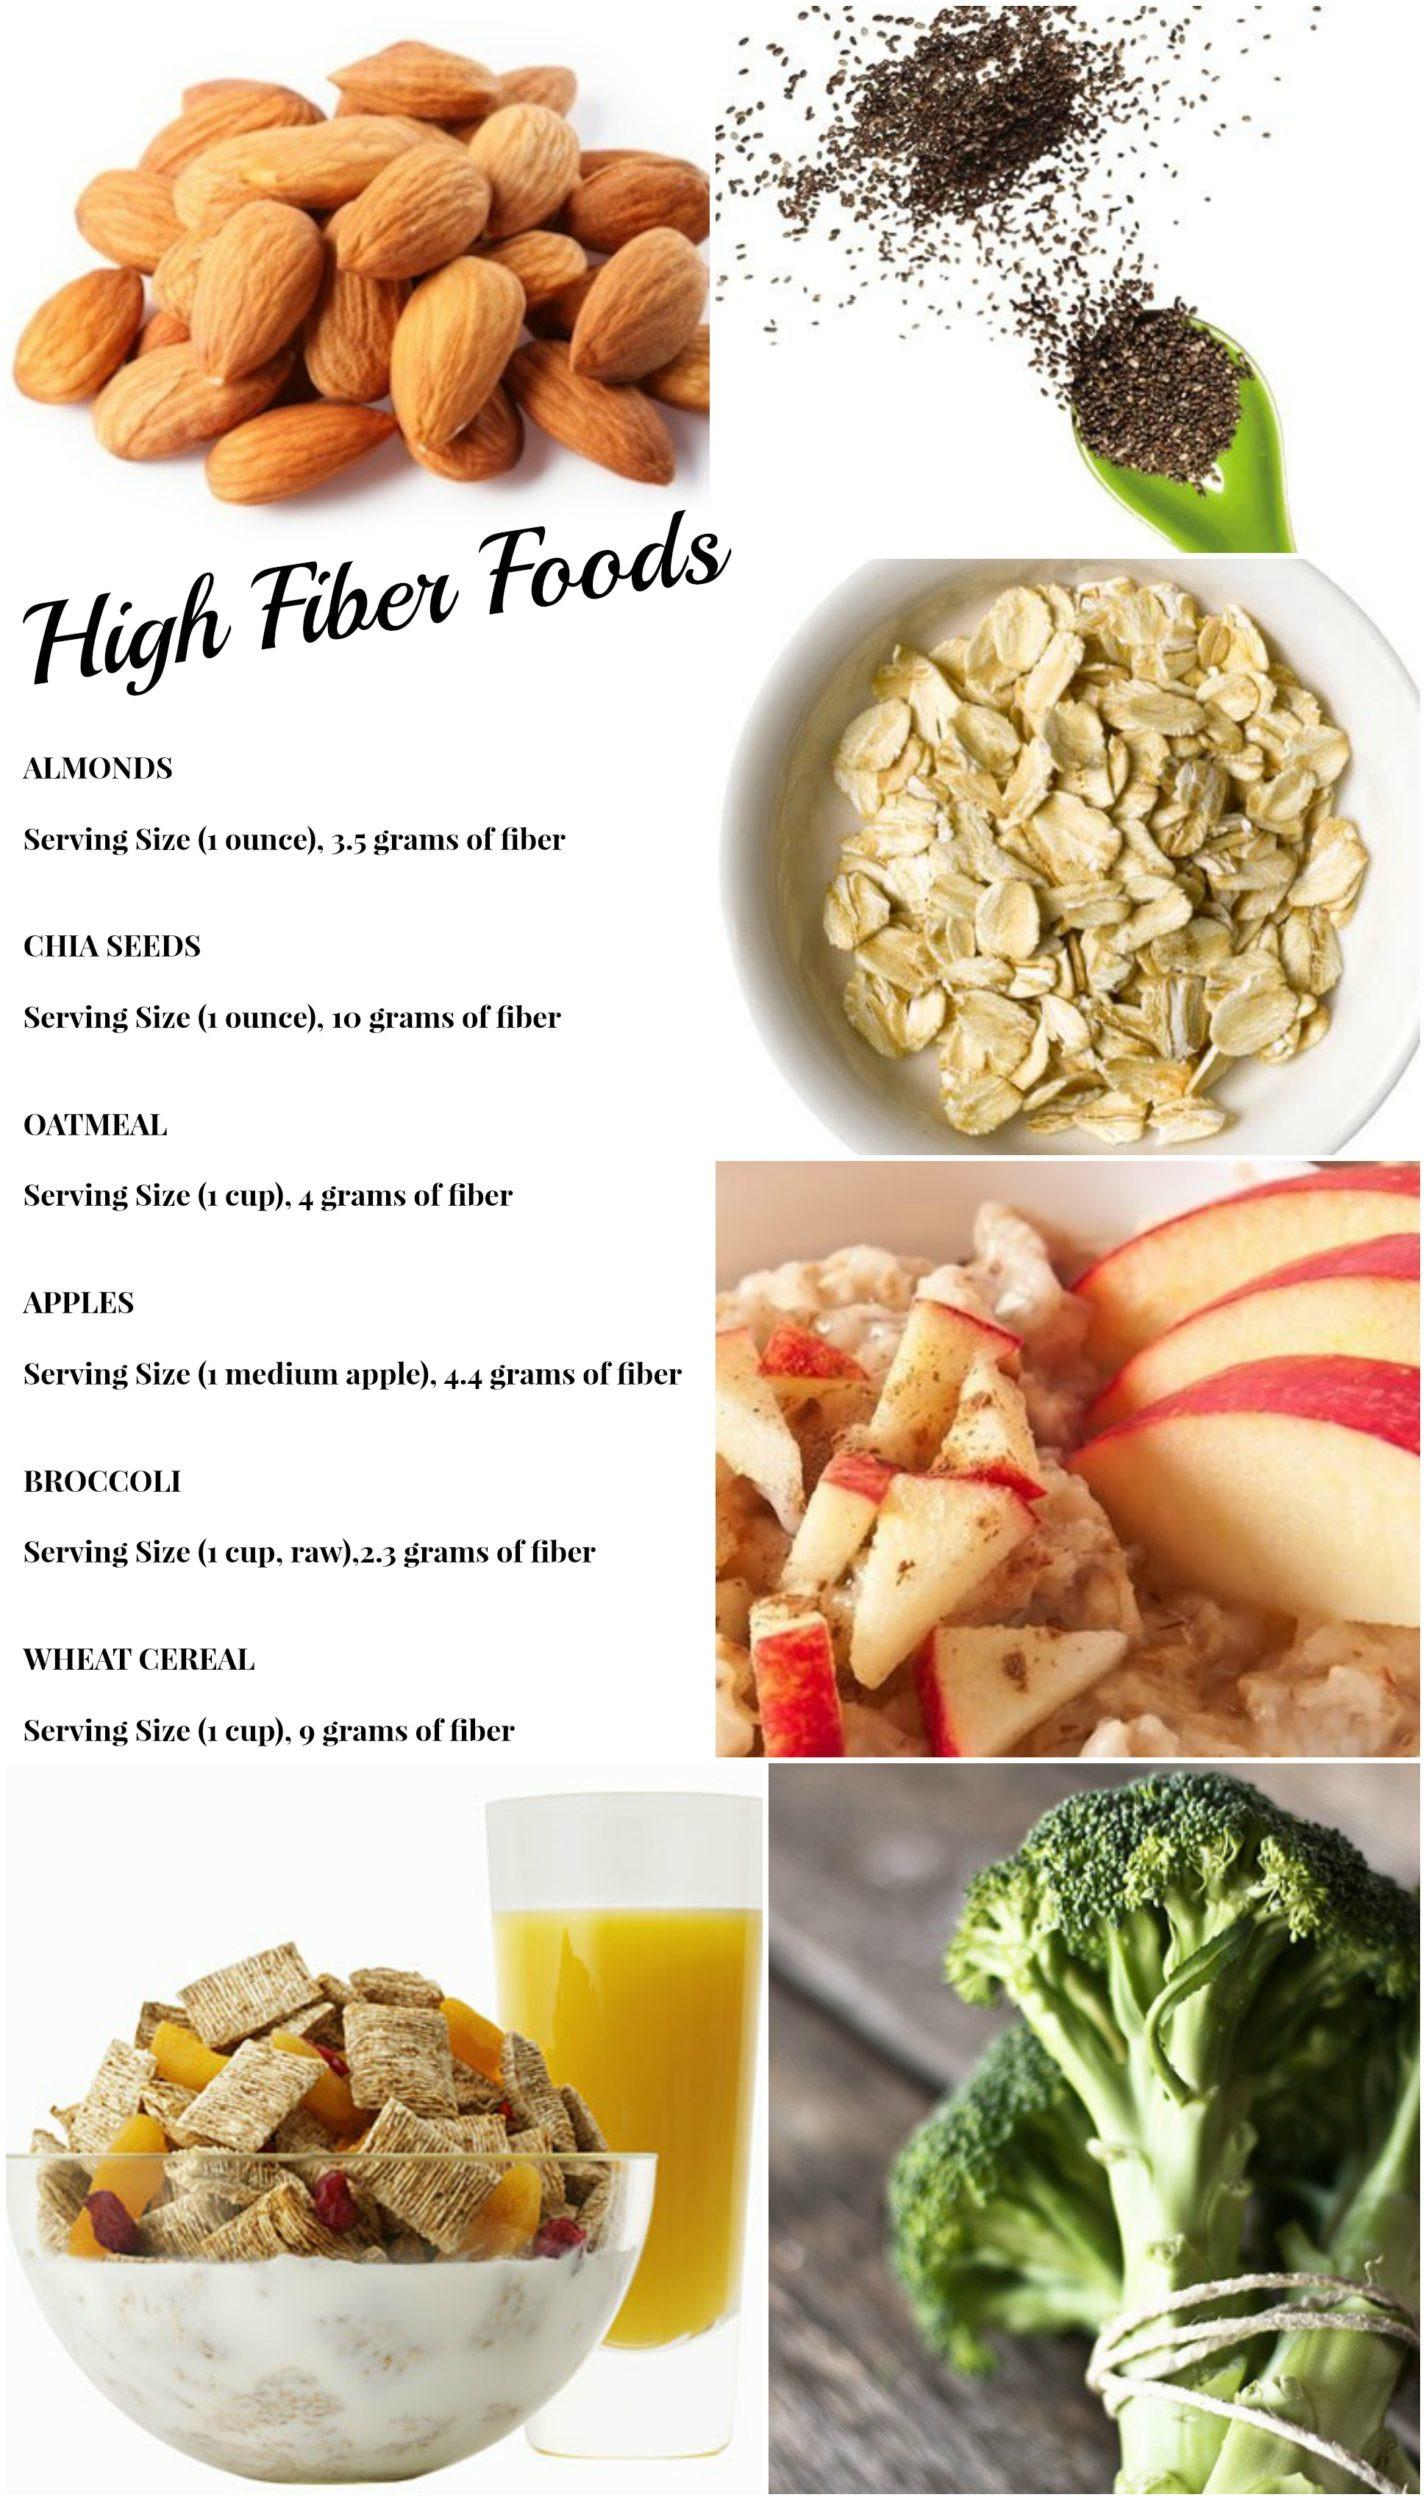 High Fiber Diet Recipes  Lose More Weight with a High Fiber Diet